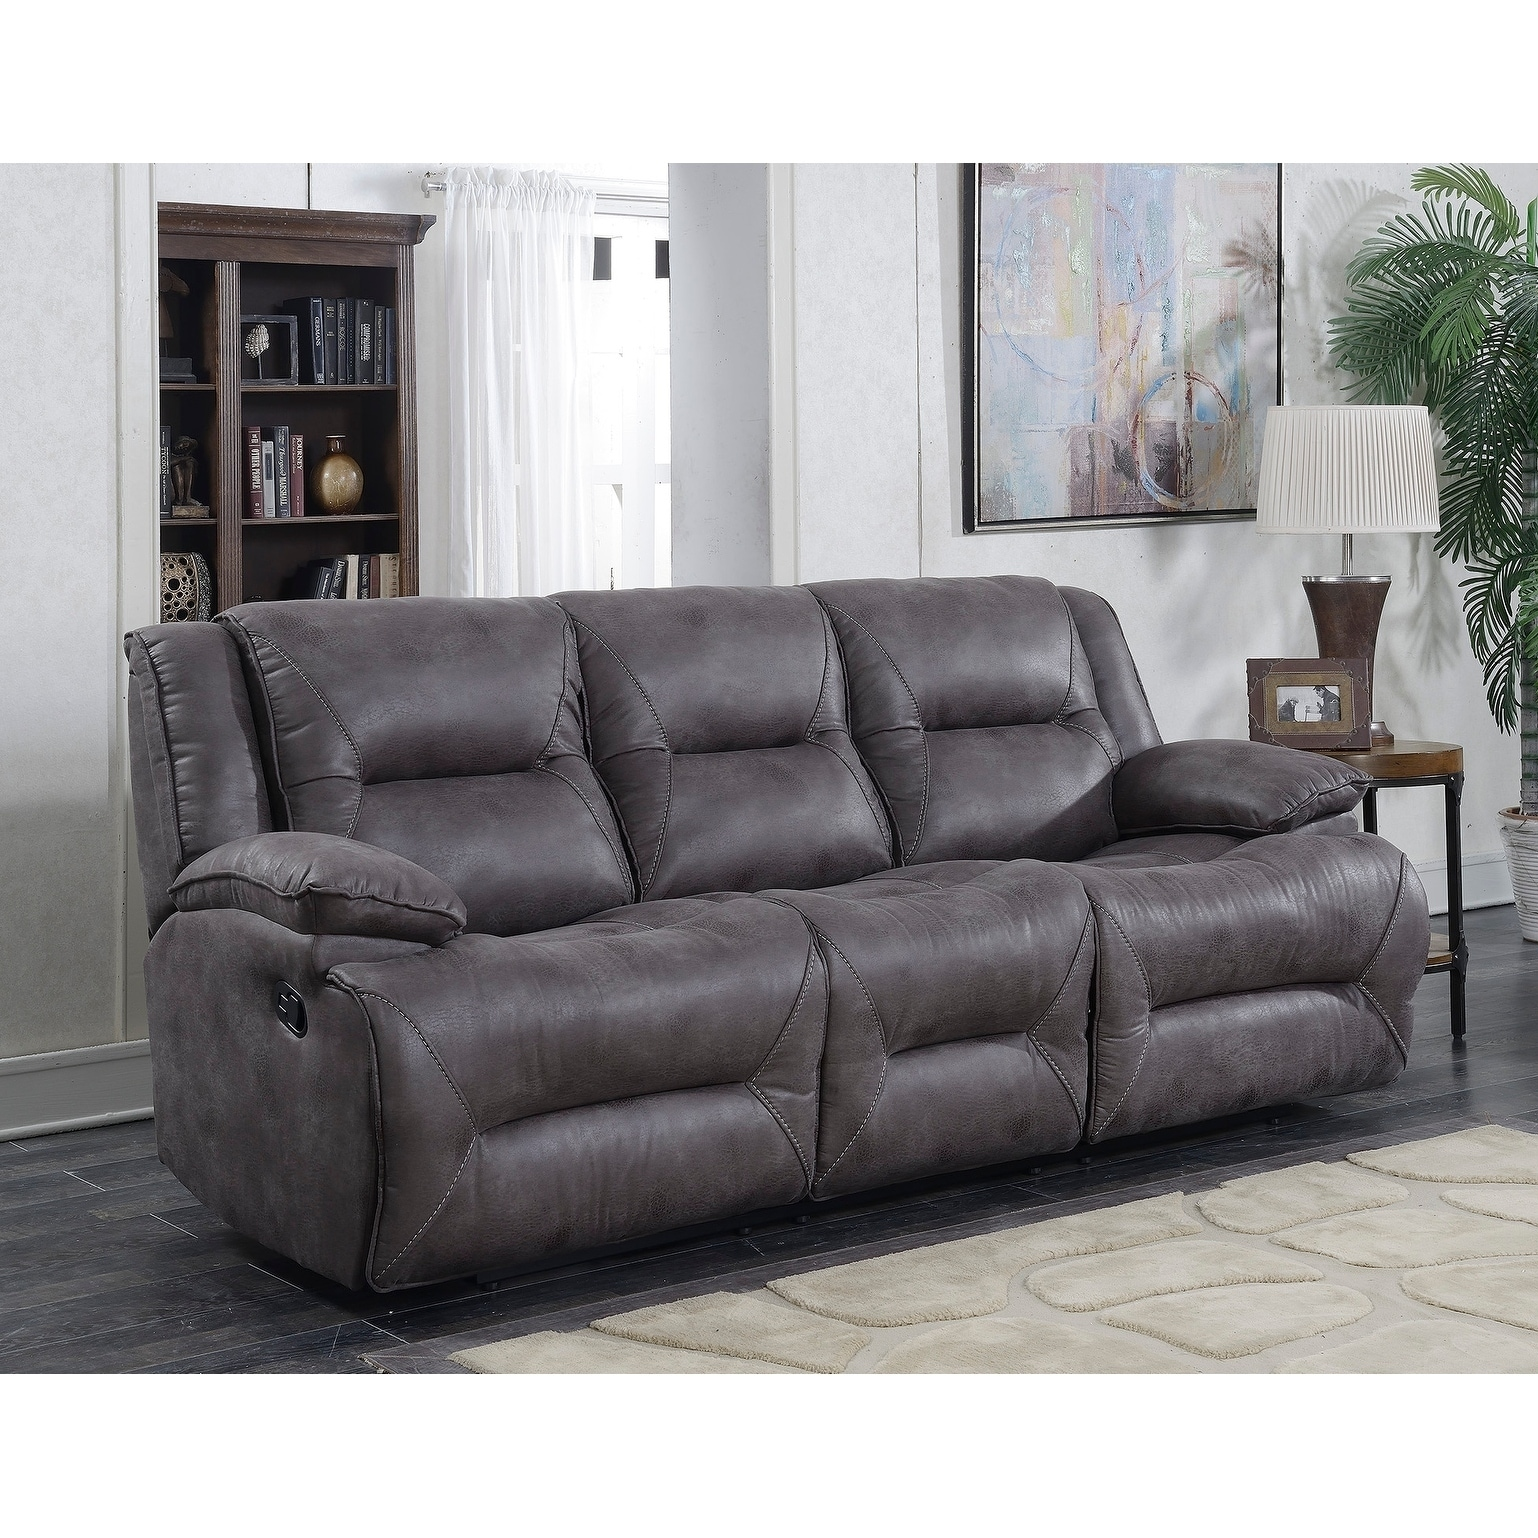 Shop Dylan Dual Lay Flat Reclining Sofa with Memory Foam Seat ...